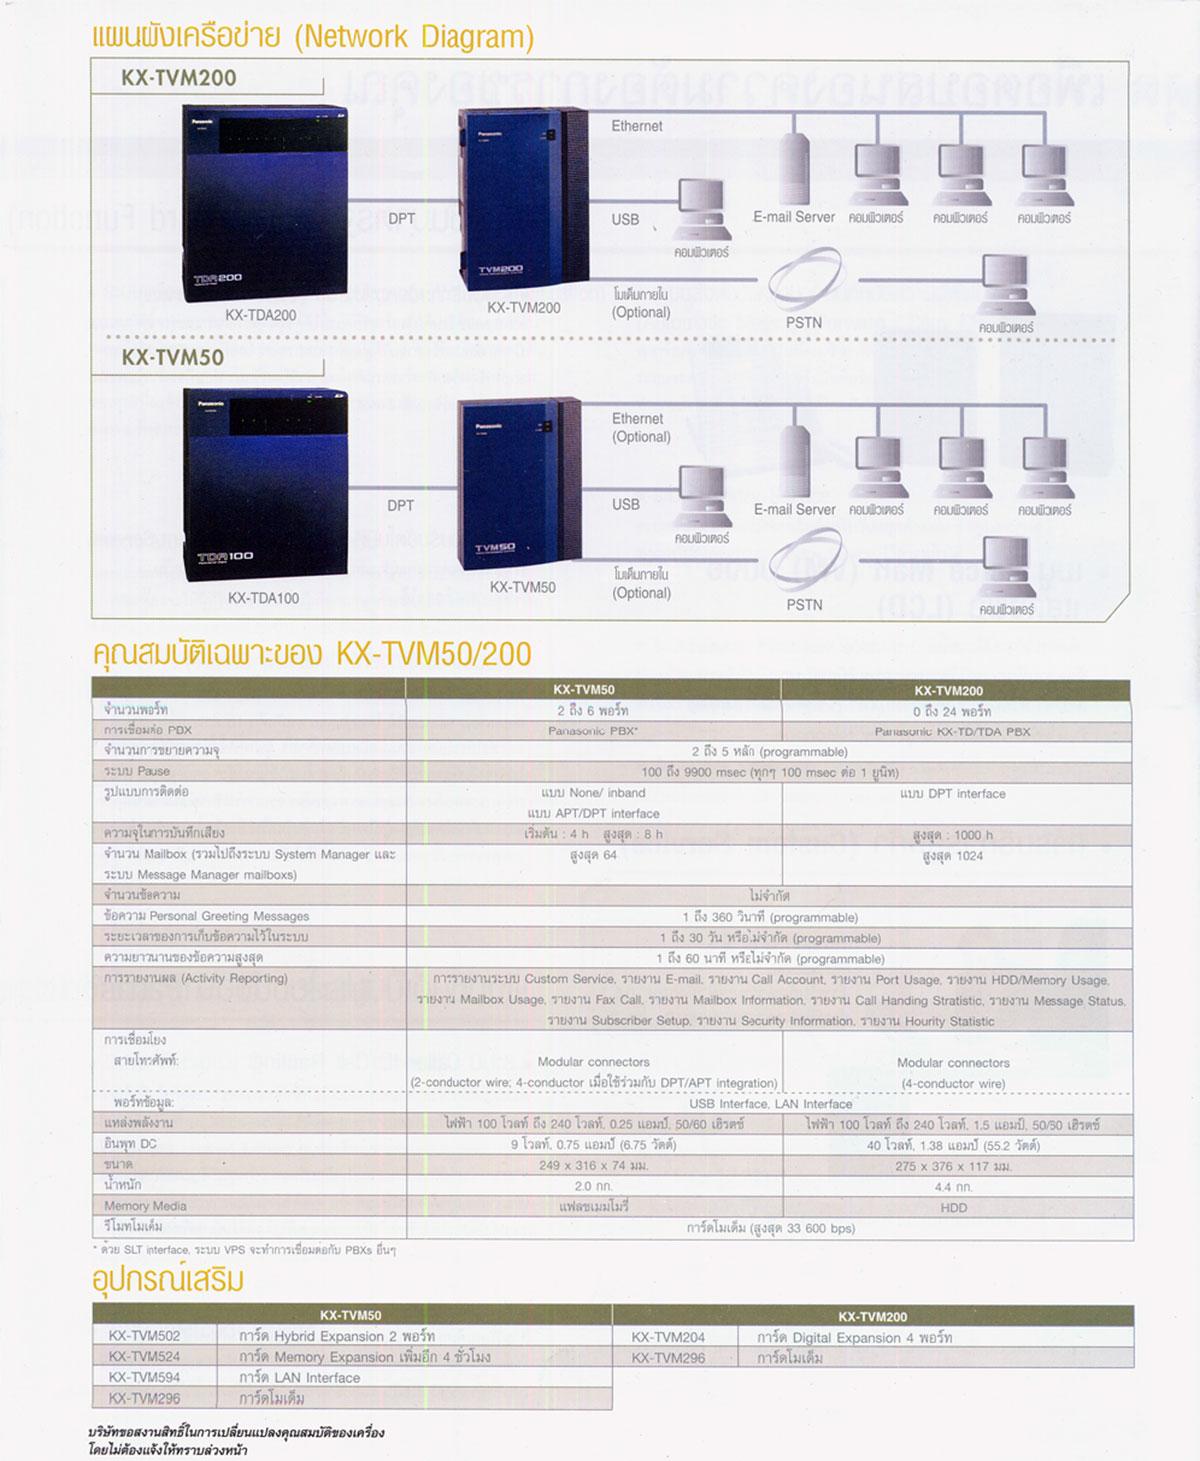 kx tvm500bx kx tvm200bx panasonic kx tda100 programming manual panasonic kx-tda100 installation manual